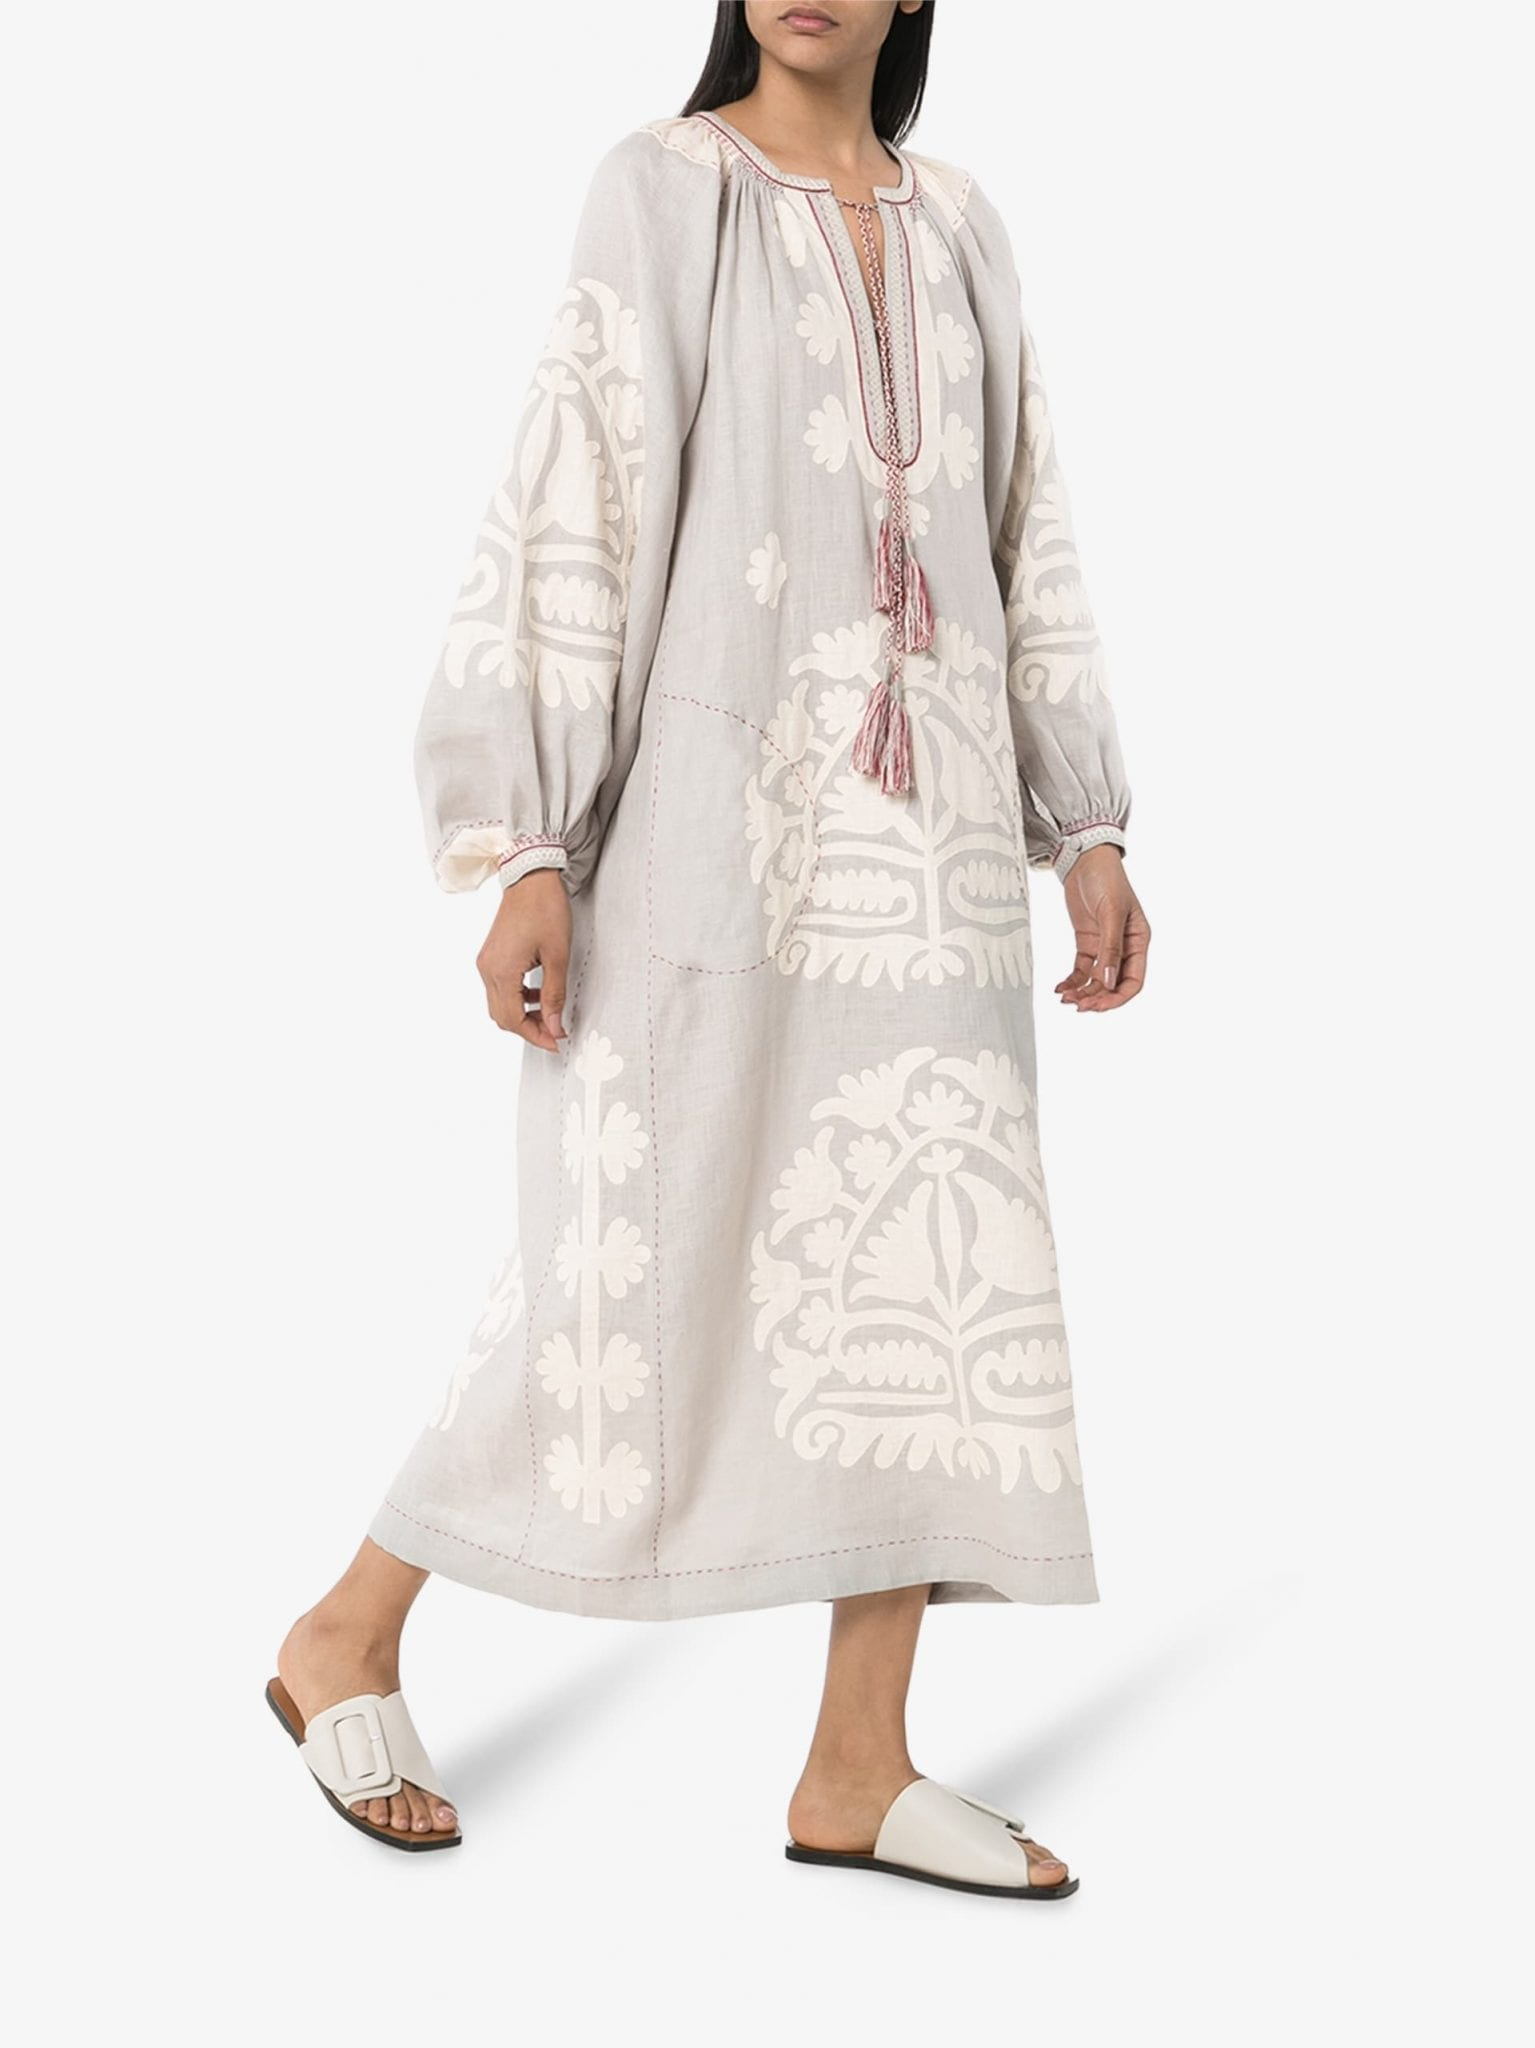 VITA KIN Fiji Embroidered Kaftan Dress